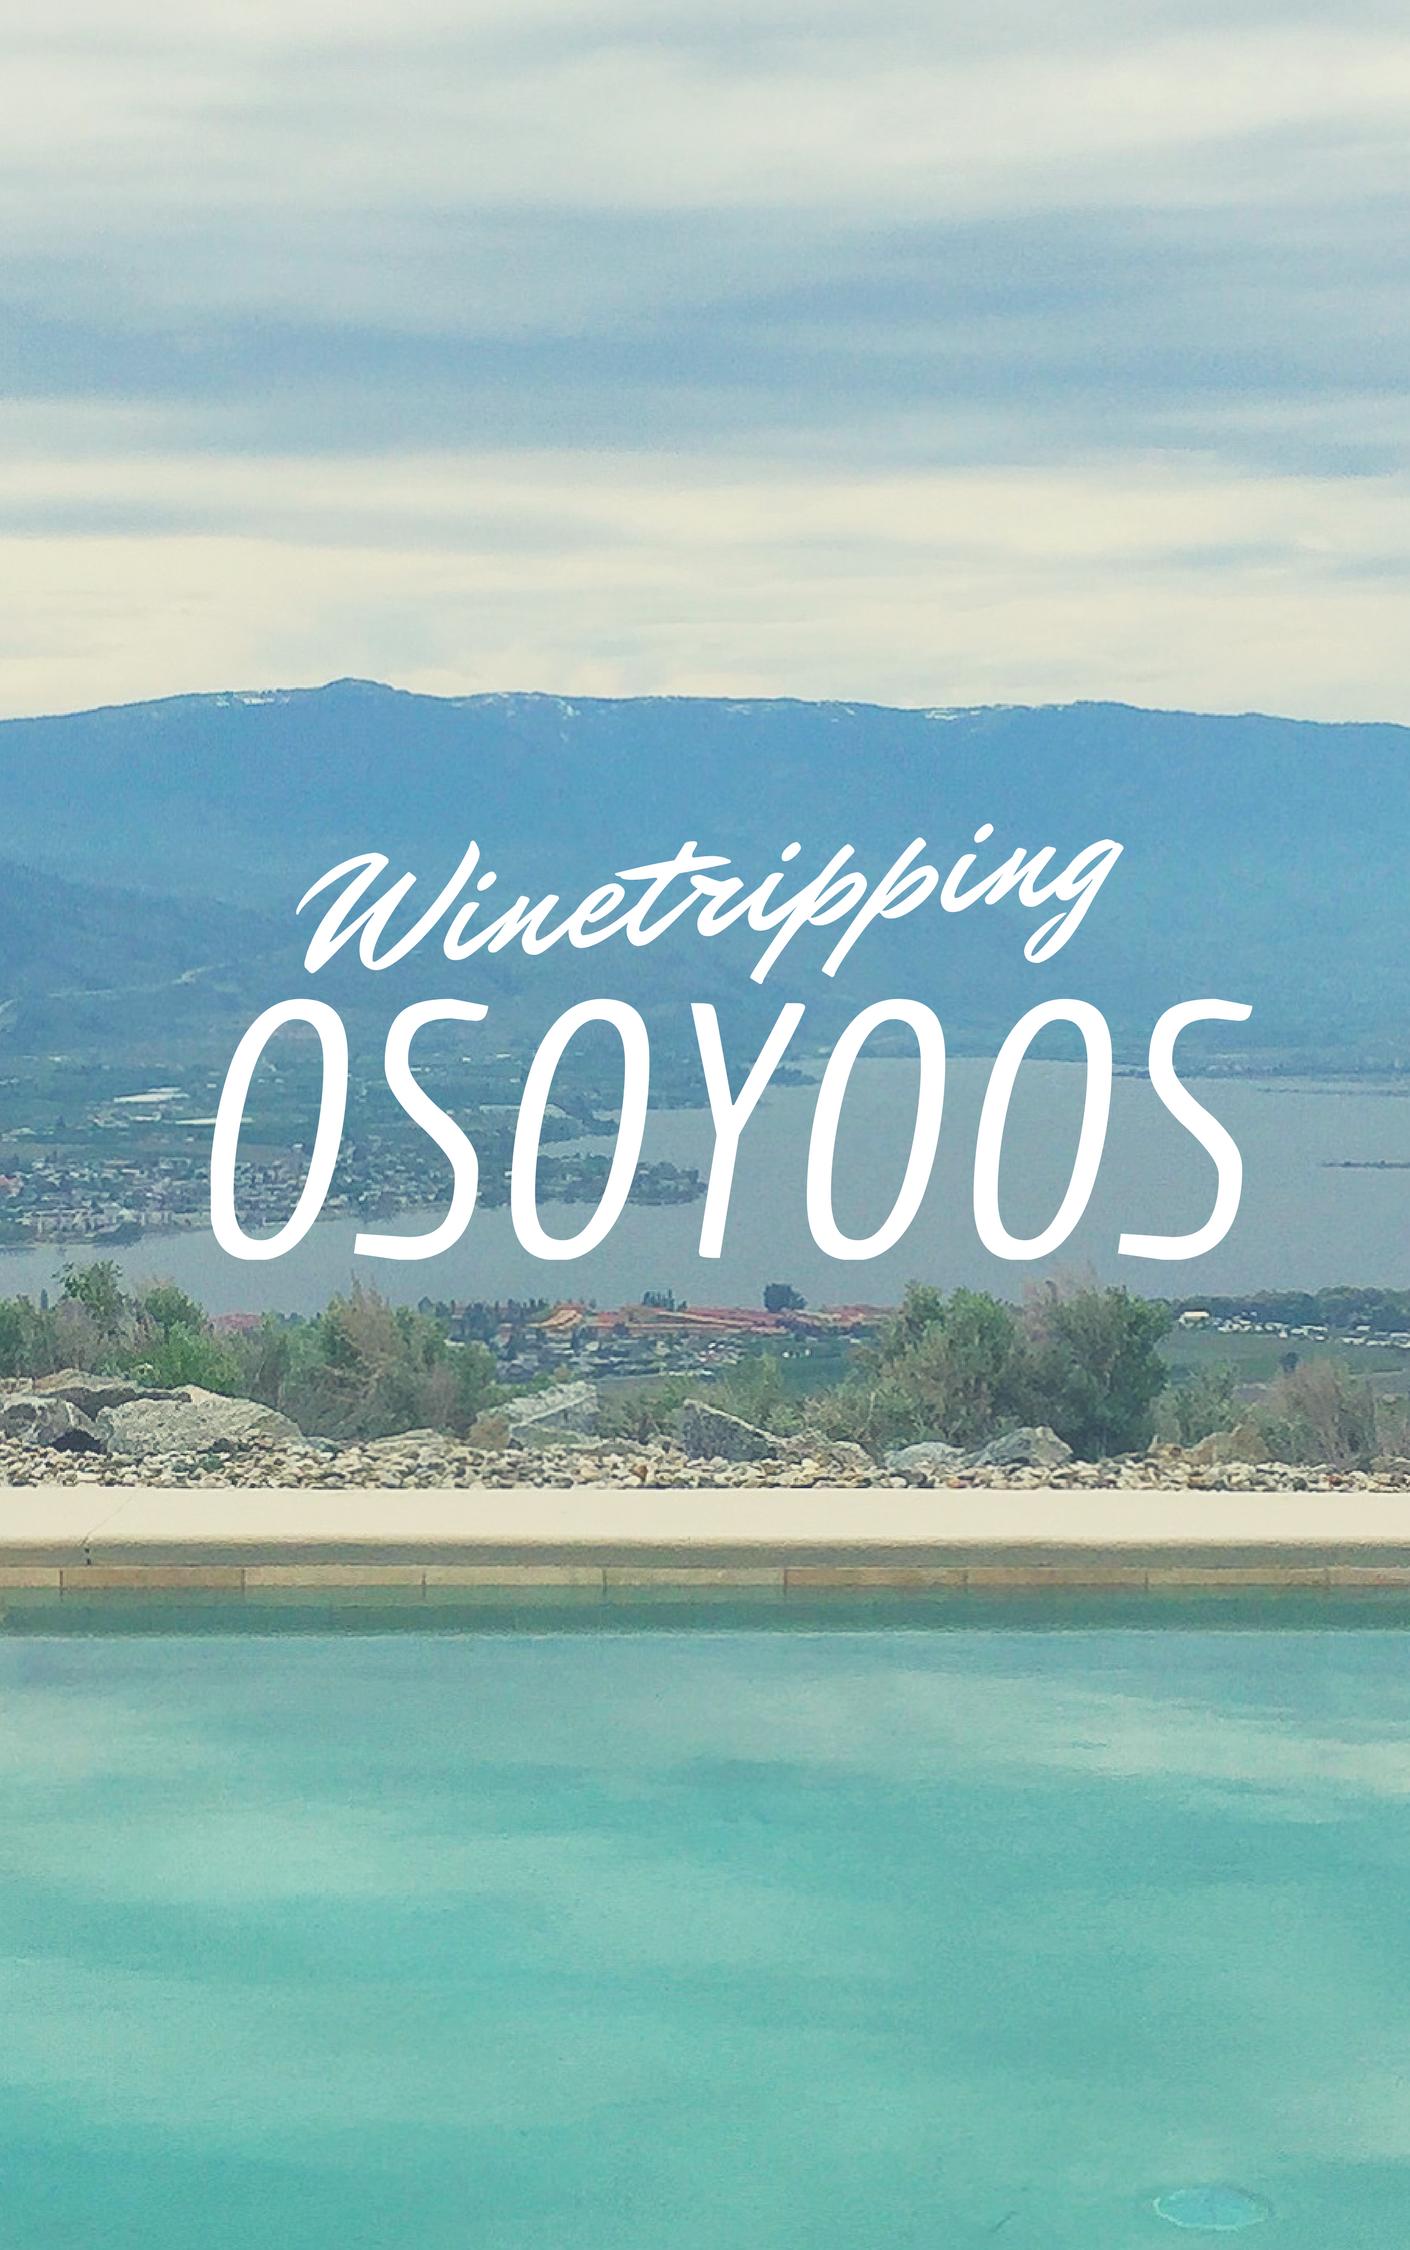 winetripping osoyoos